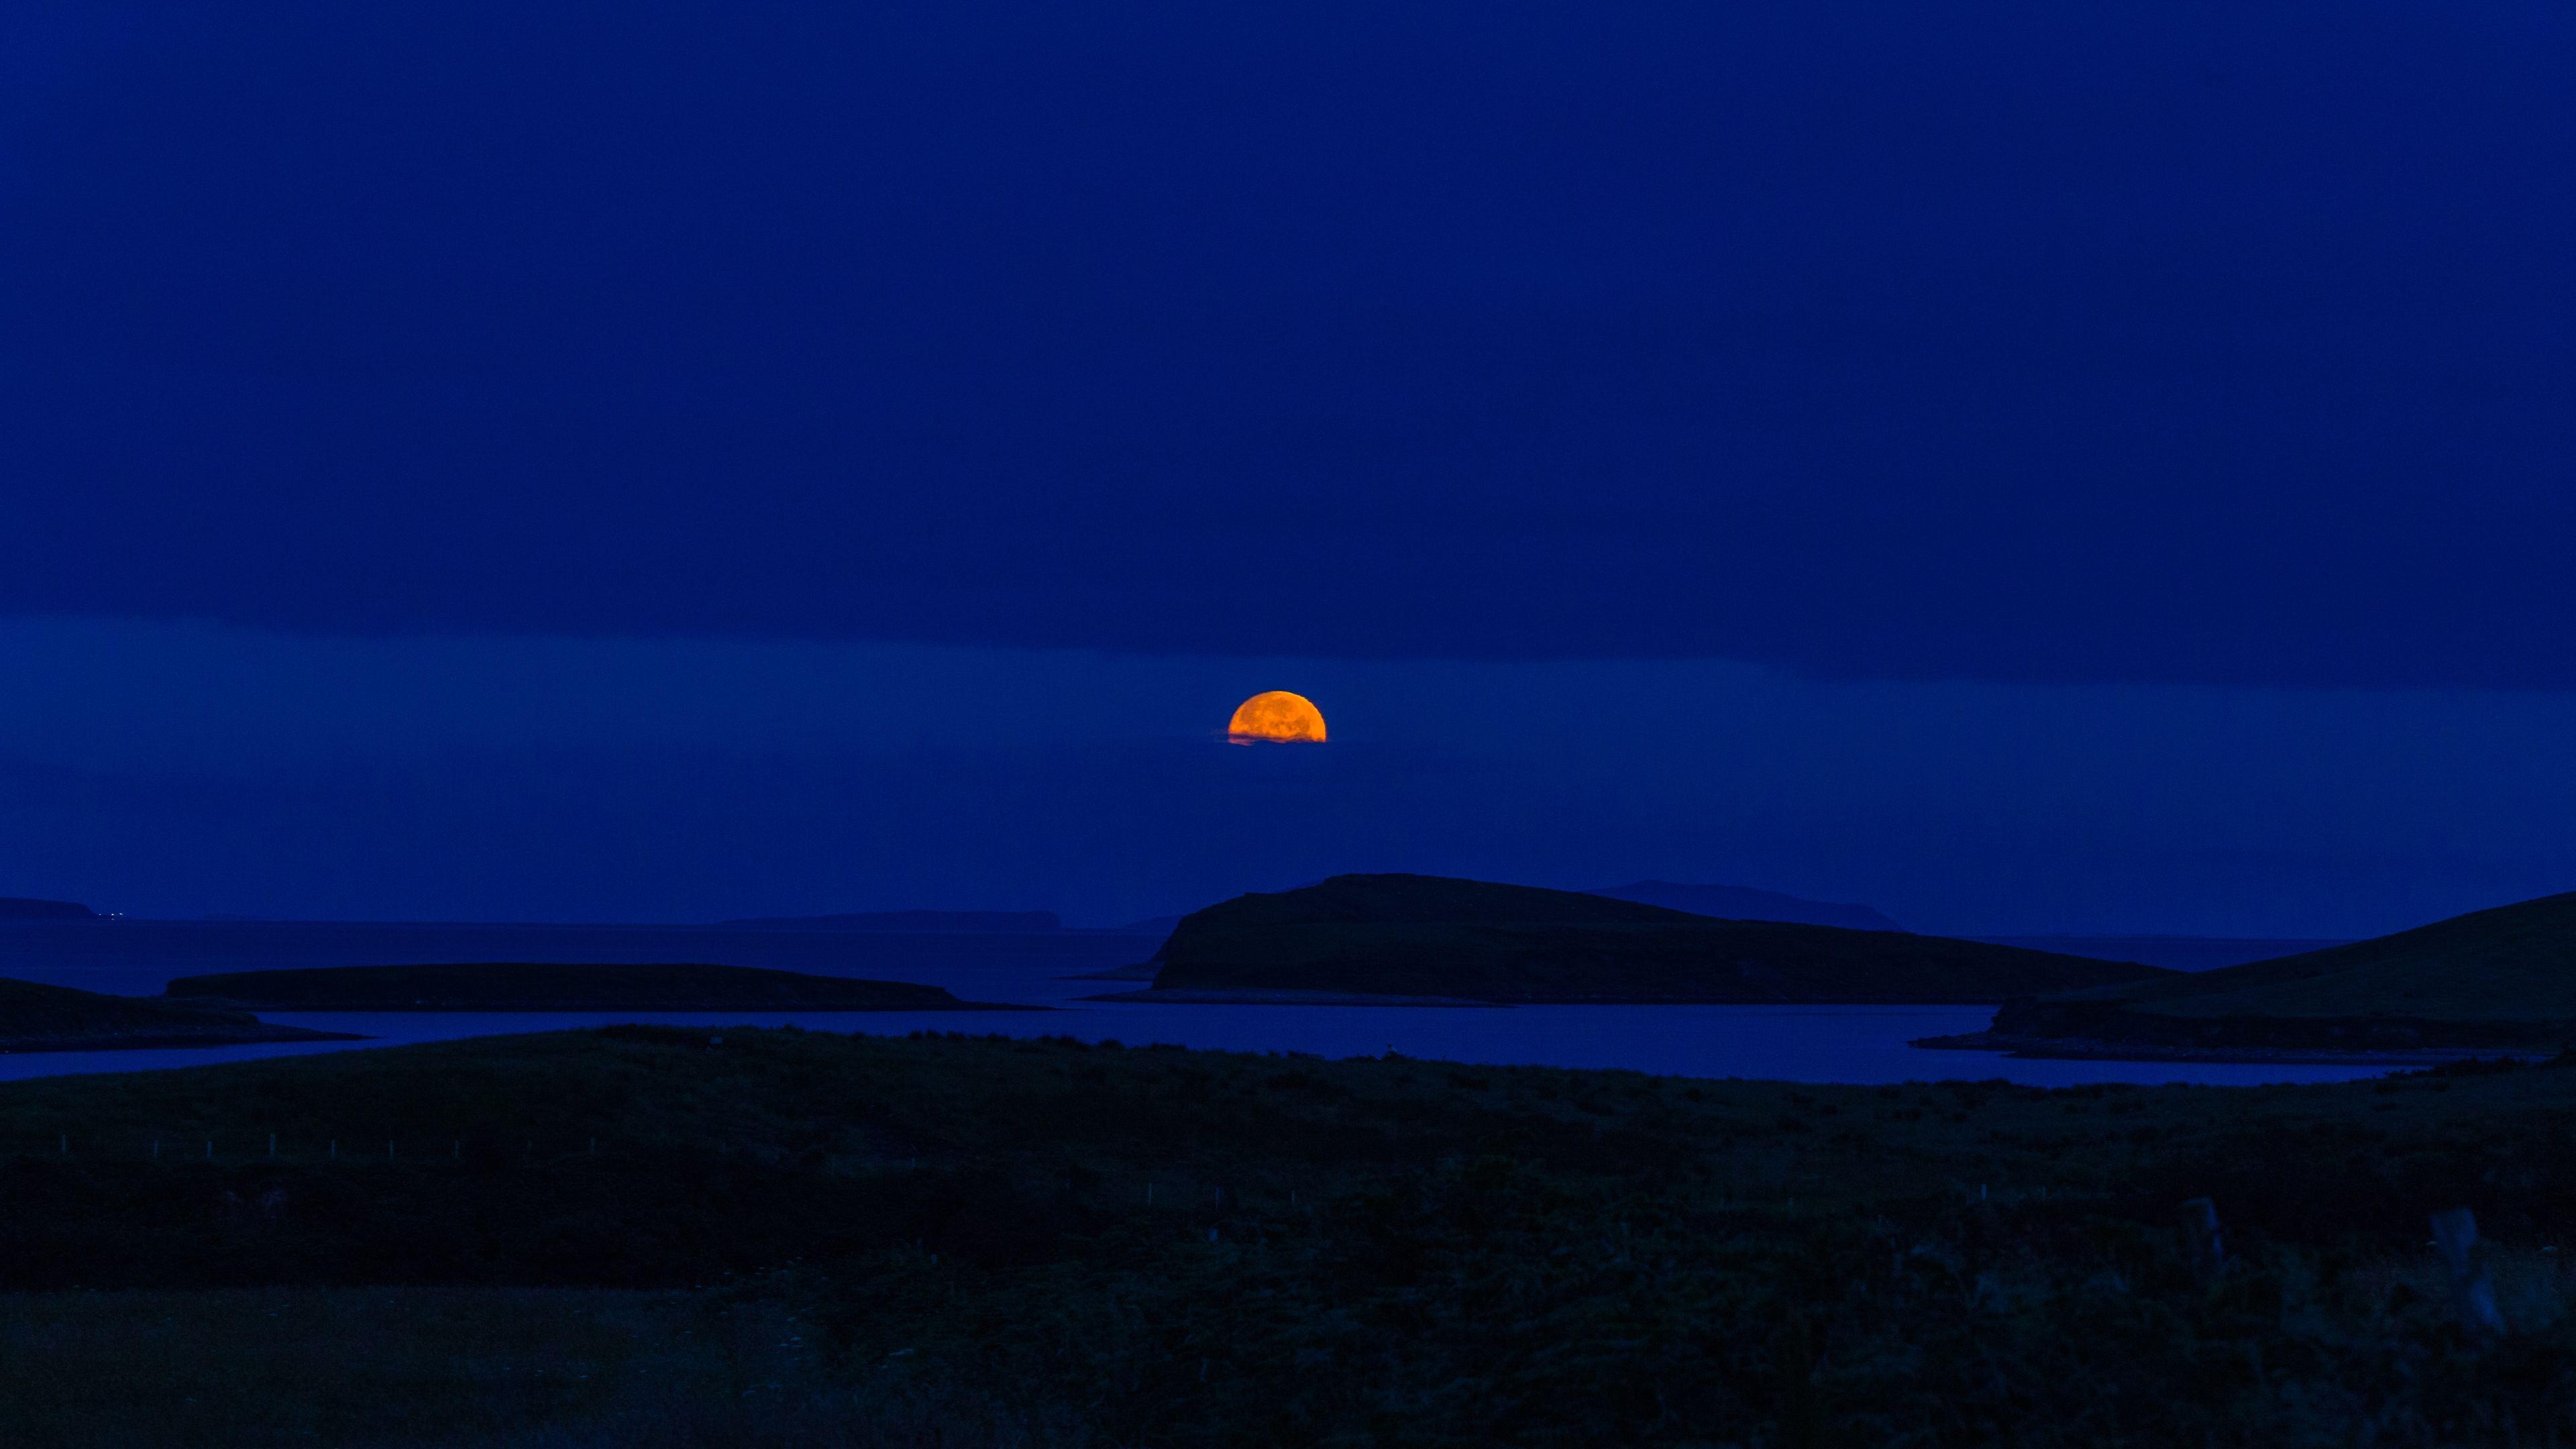 blue sky dark sunset 4k 1551643565 - Blue Sky Dark Sunset 4k - sunset wallpapers, nature wallpapers, hd-wallpapers, blue wallpapers, 4k-wallpapers